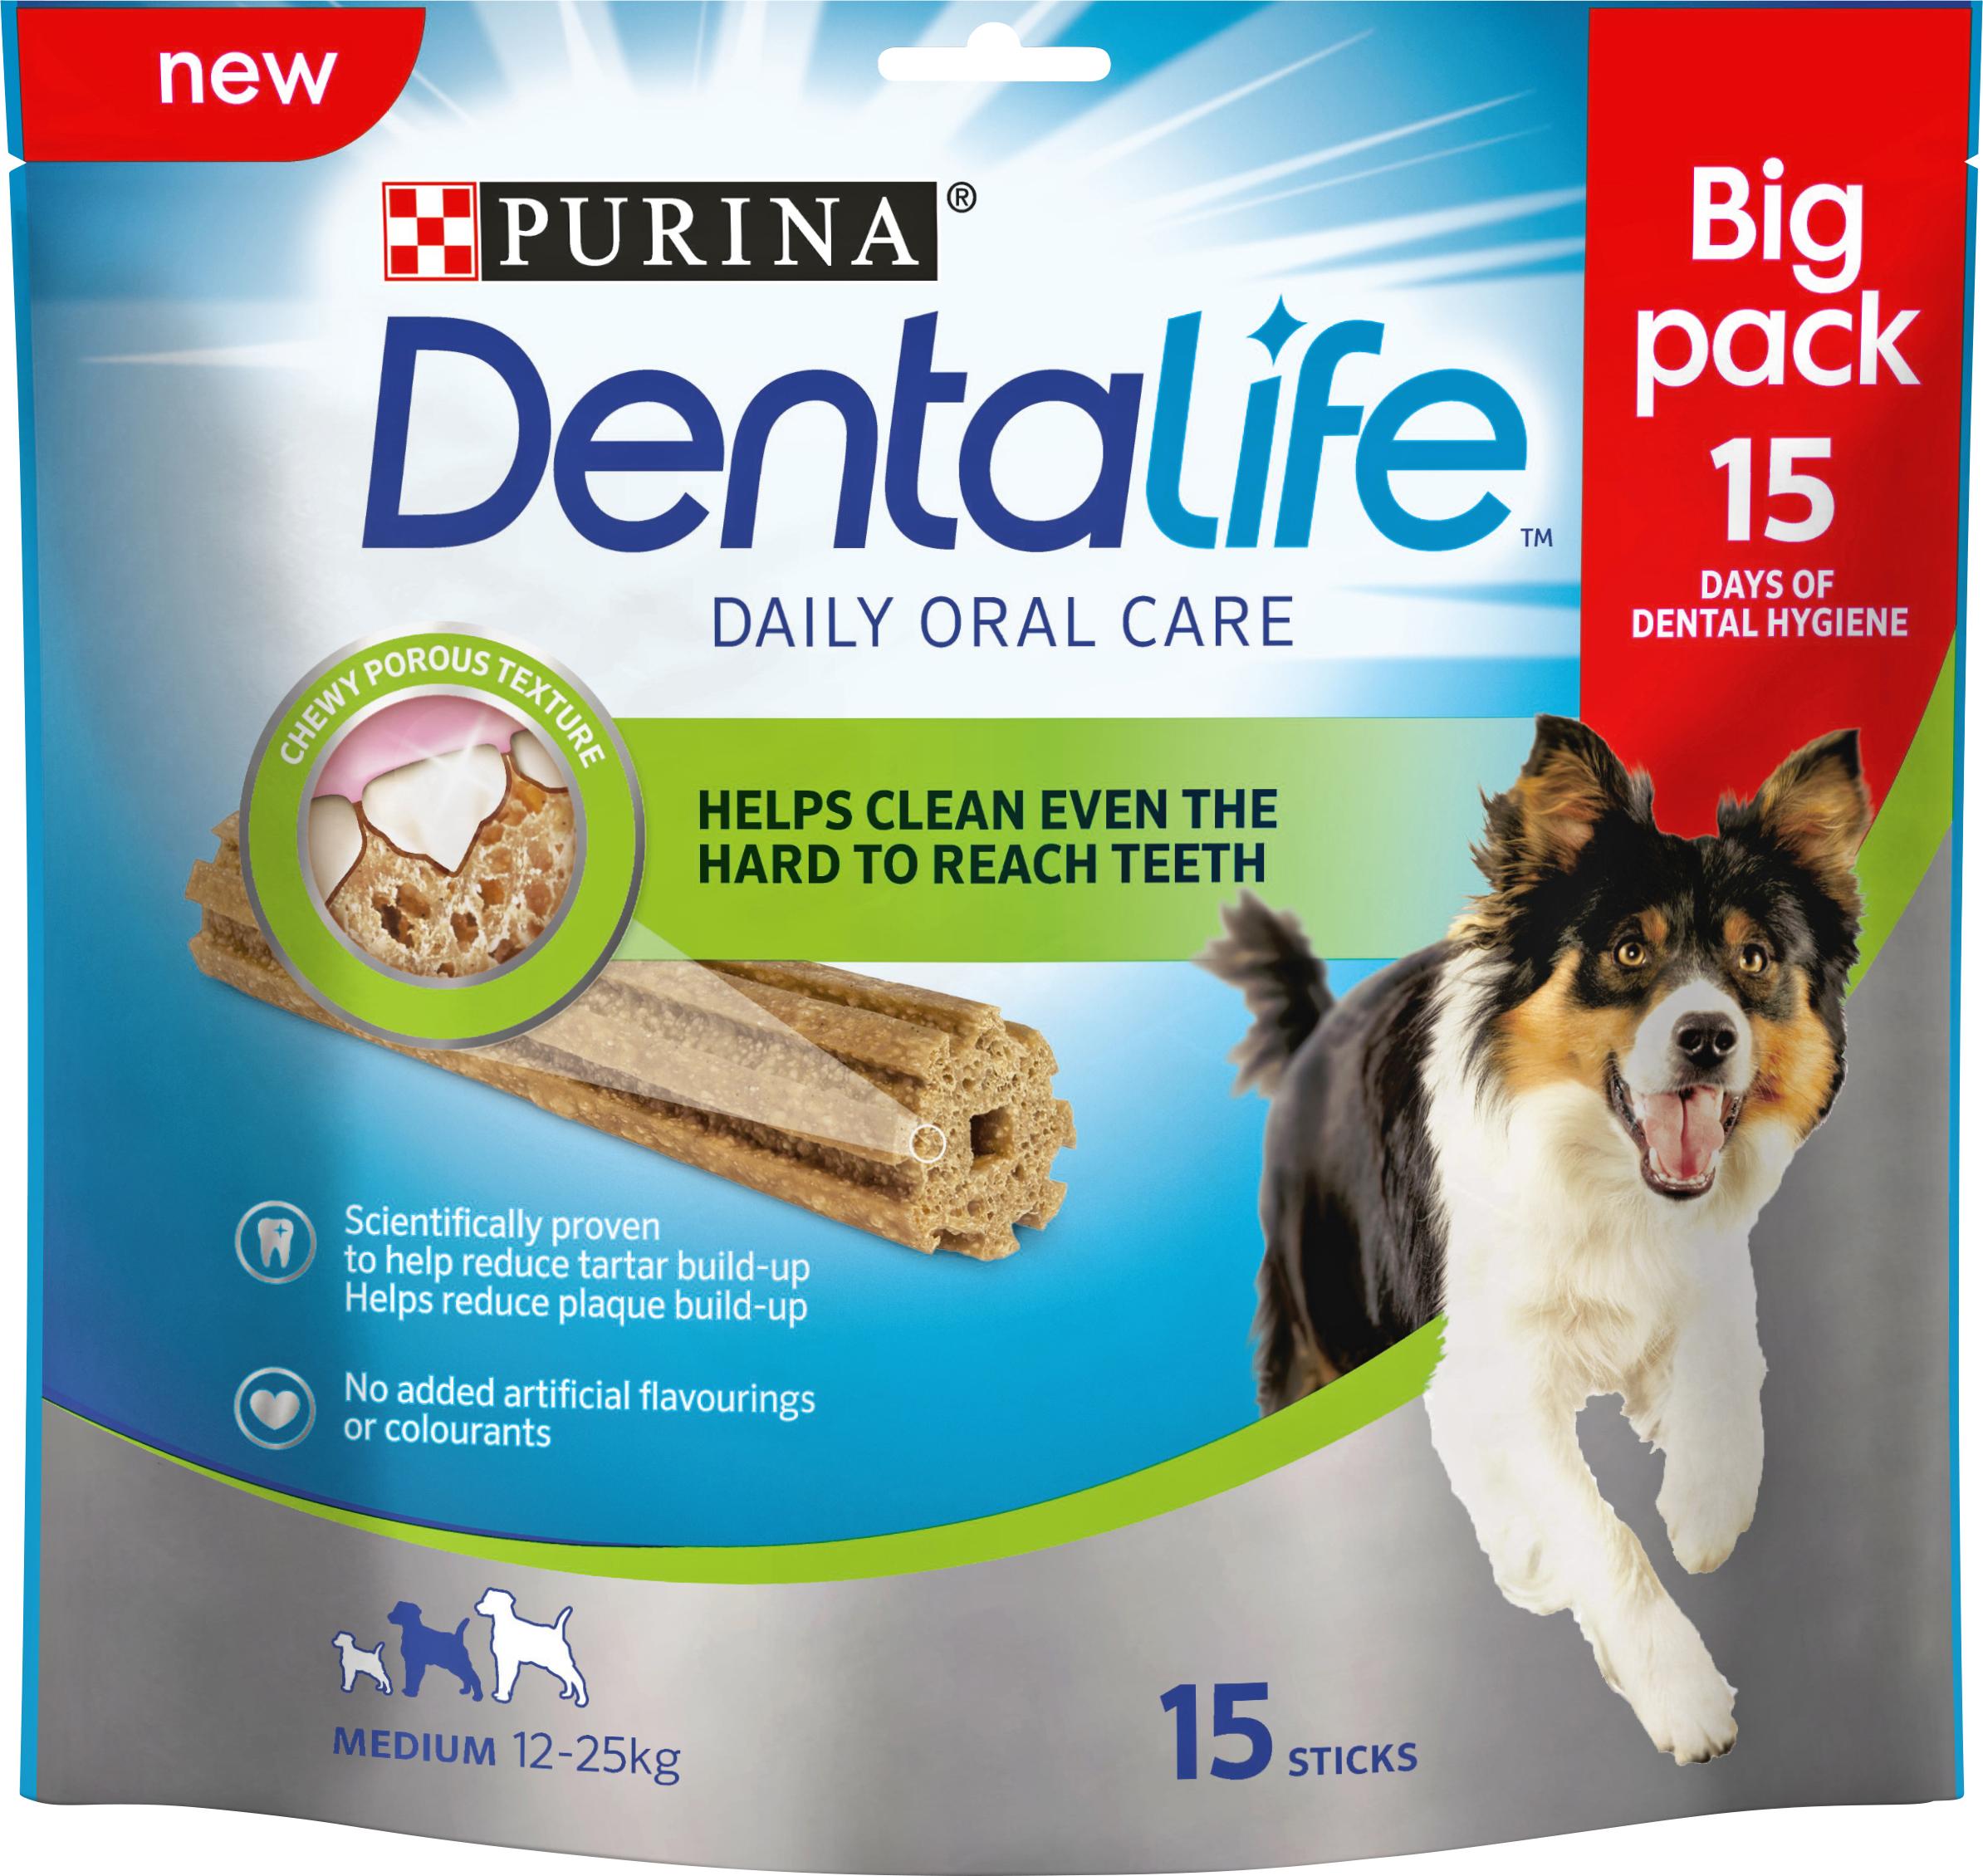 DentaLife tuggpinne Medium - 1 påse, 15 st tuggpinnar